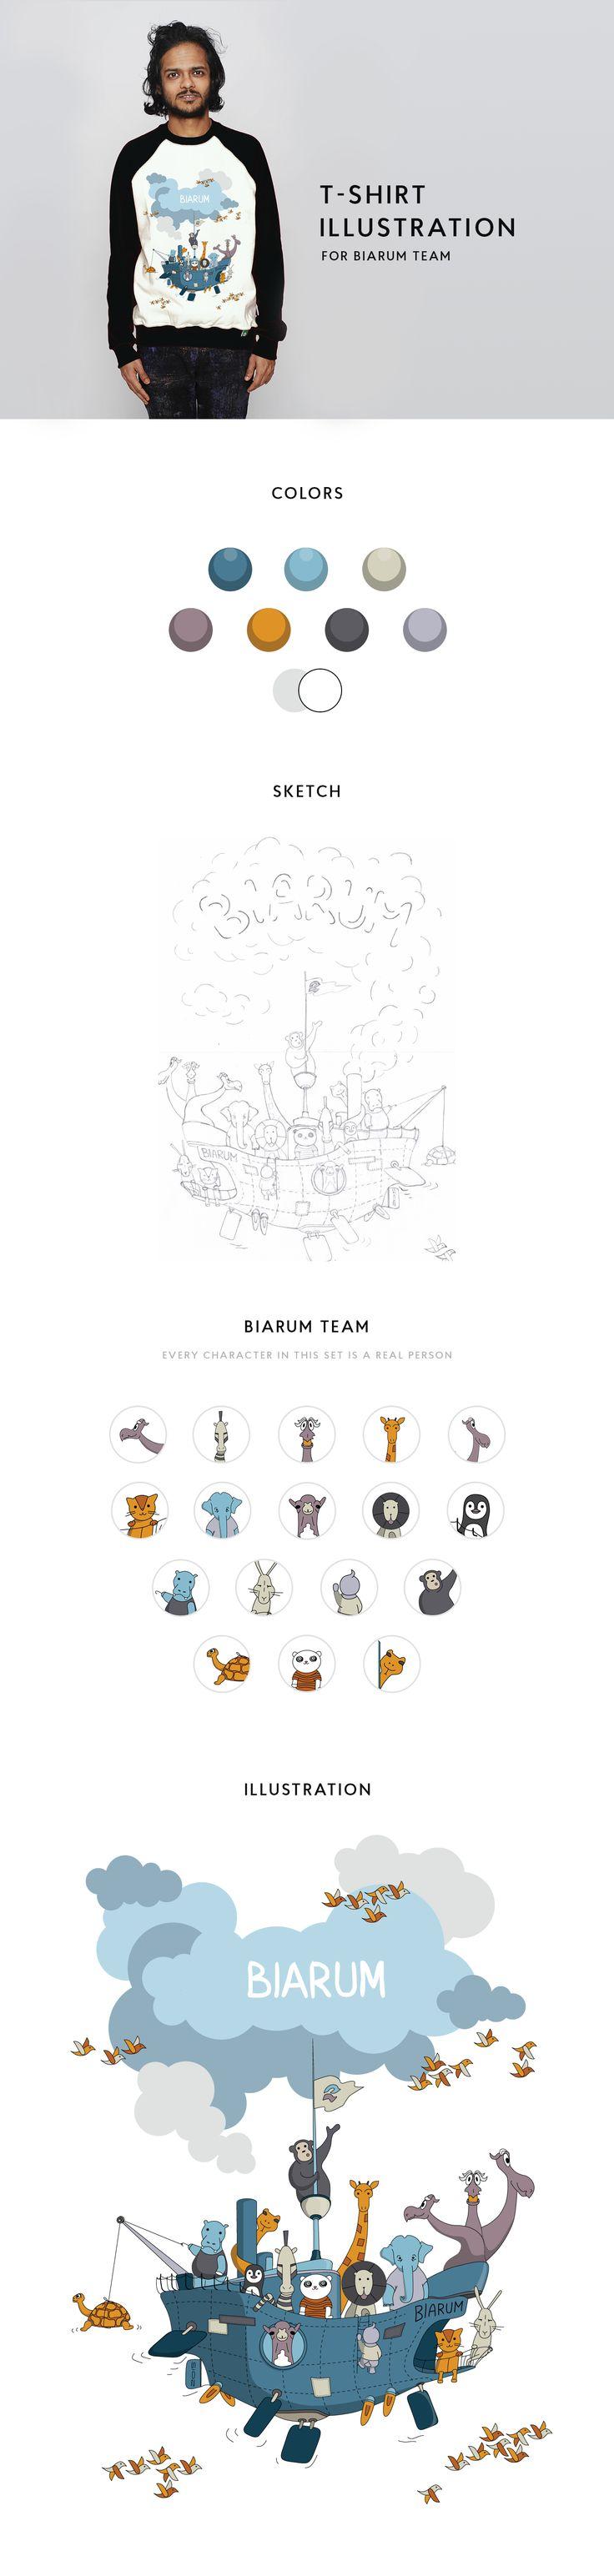 T-shirt illustration for Biarum team